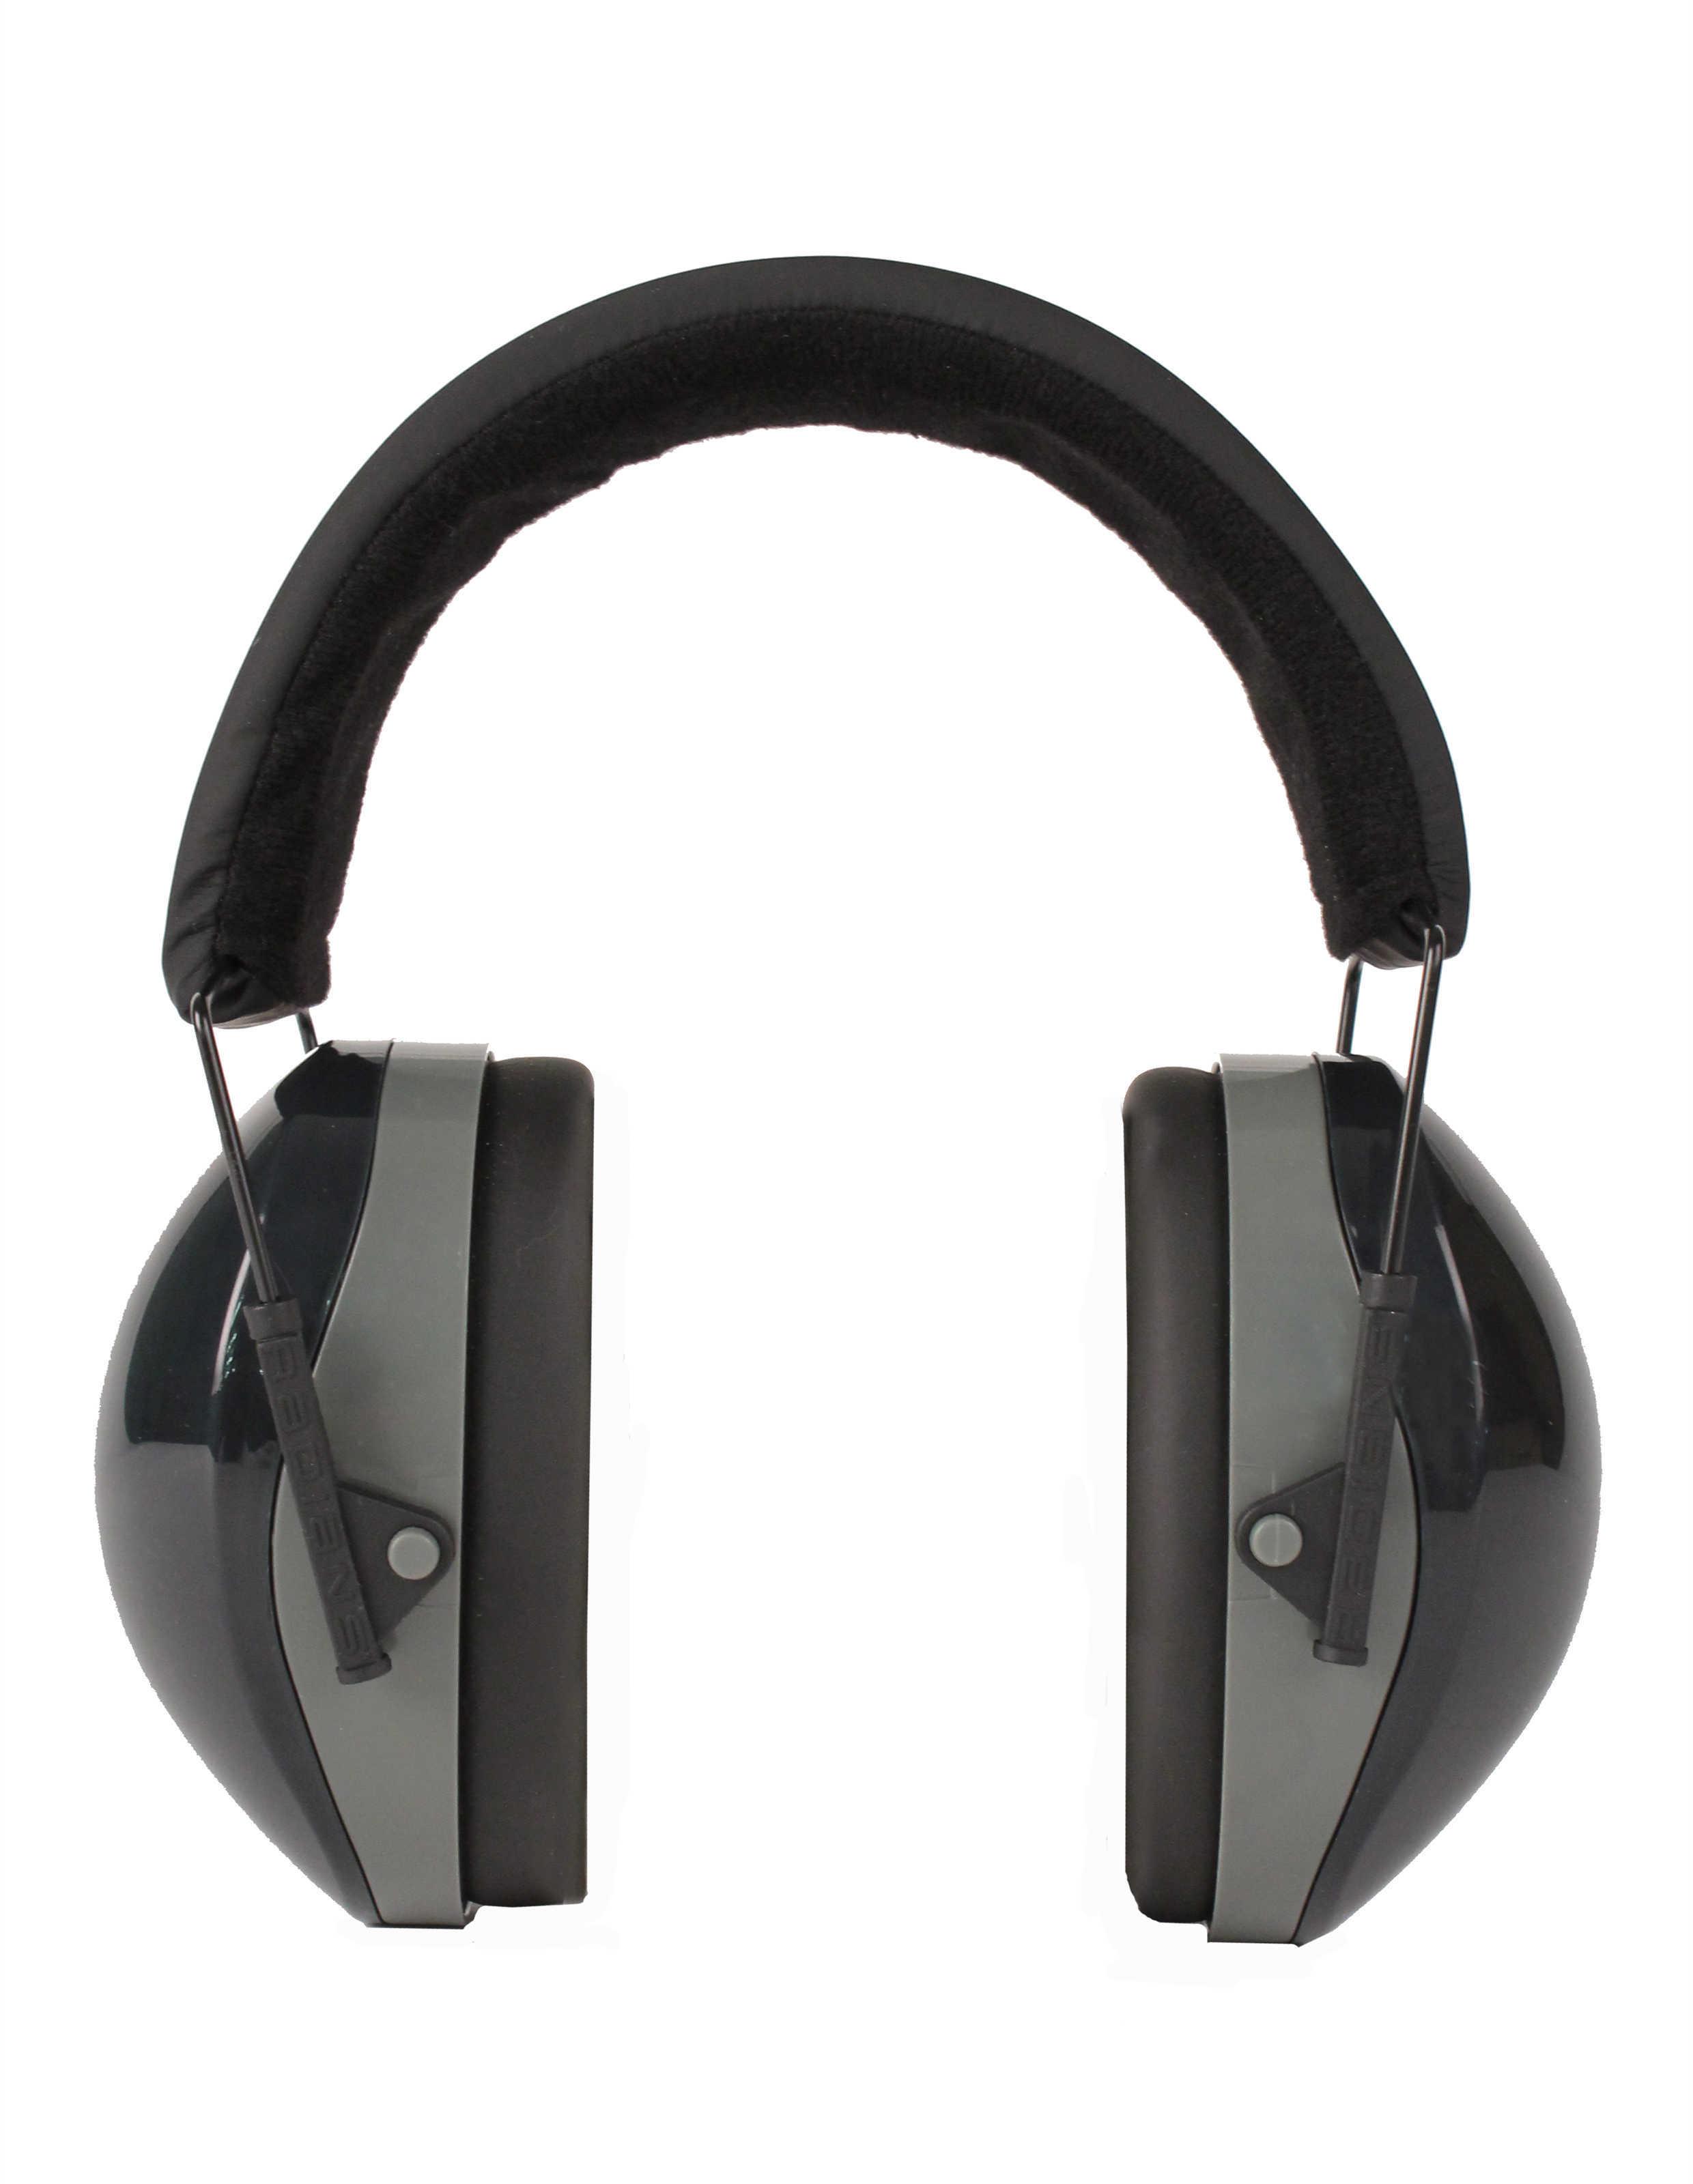 Radians Maximum Comfort Earmuffs With Soft Lightweight Padded Headband Md: TR0160Cs